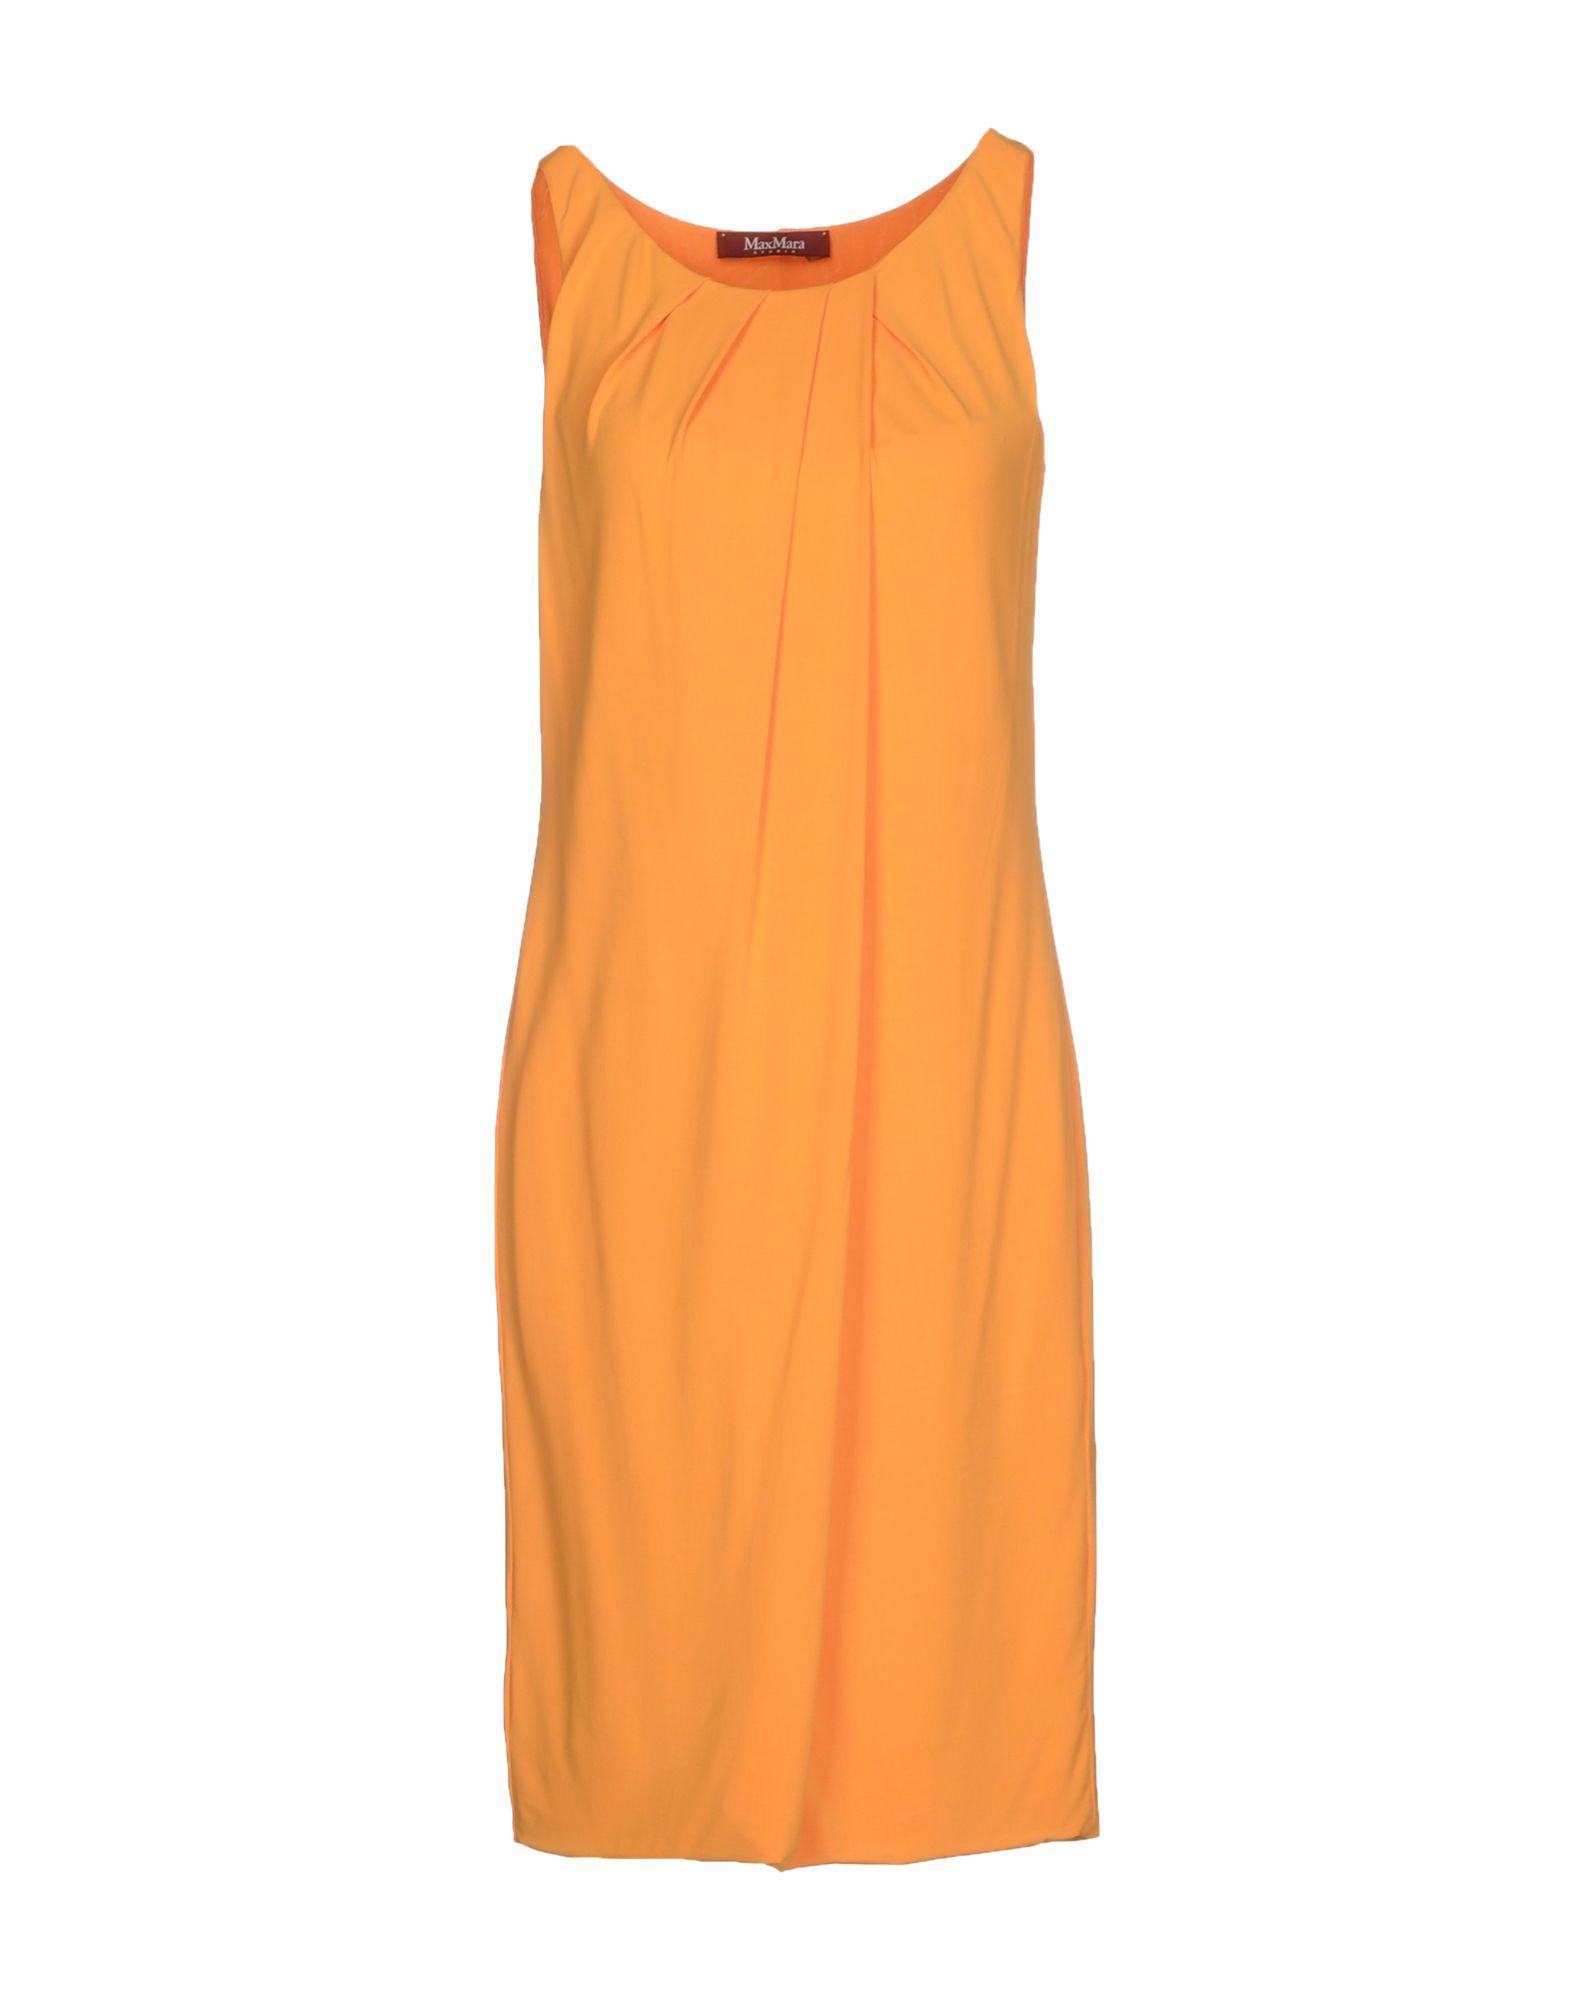 max mara studio short dress in orange lyst. Black Bedroom Furniture Sets. Home Design Ideas